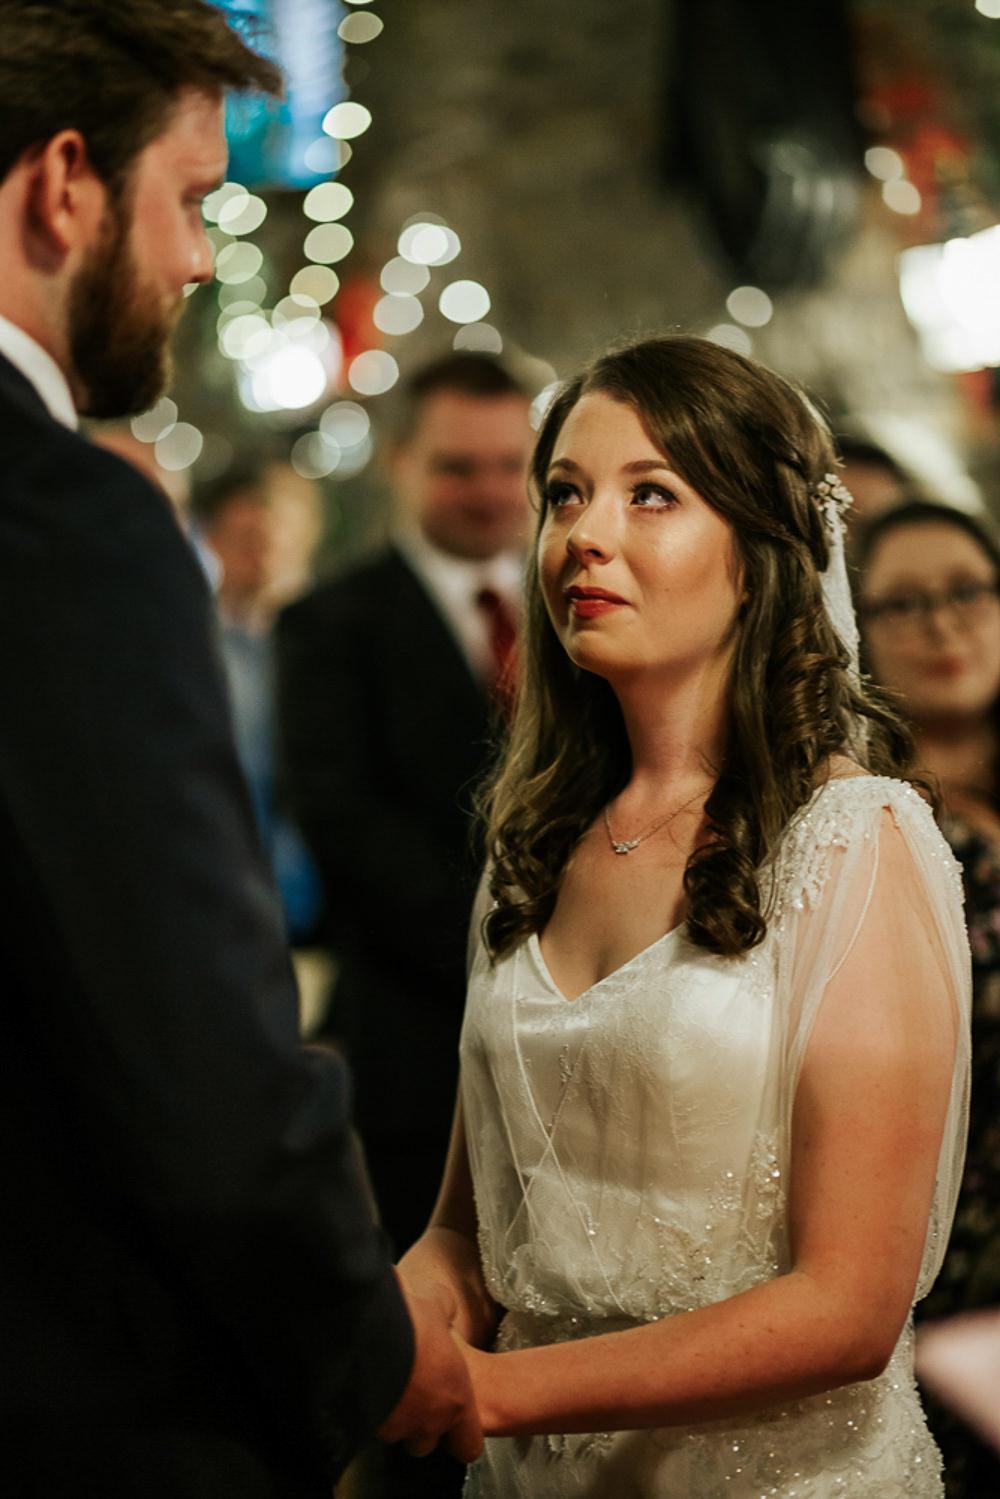 Bride Bridal Dress Cape Sleeve V Neck Lace Embellished Groom Burnt Orange Tie Black Suit Veil Cubley Hall Wedding Photography by Charli